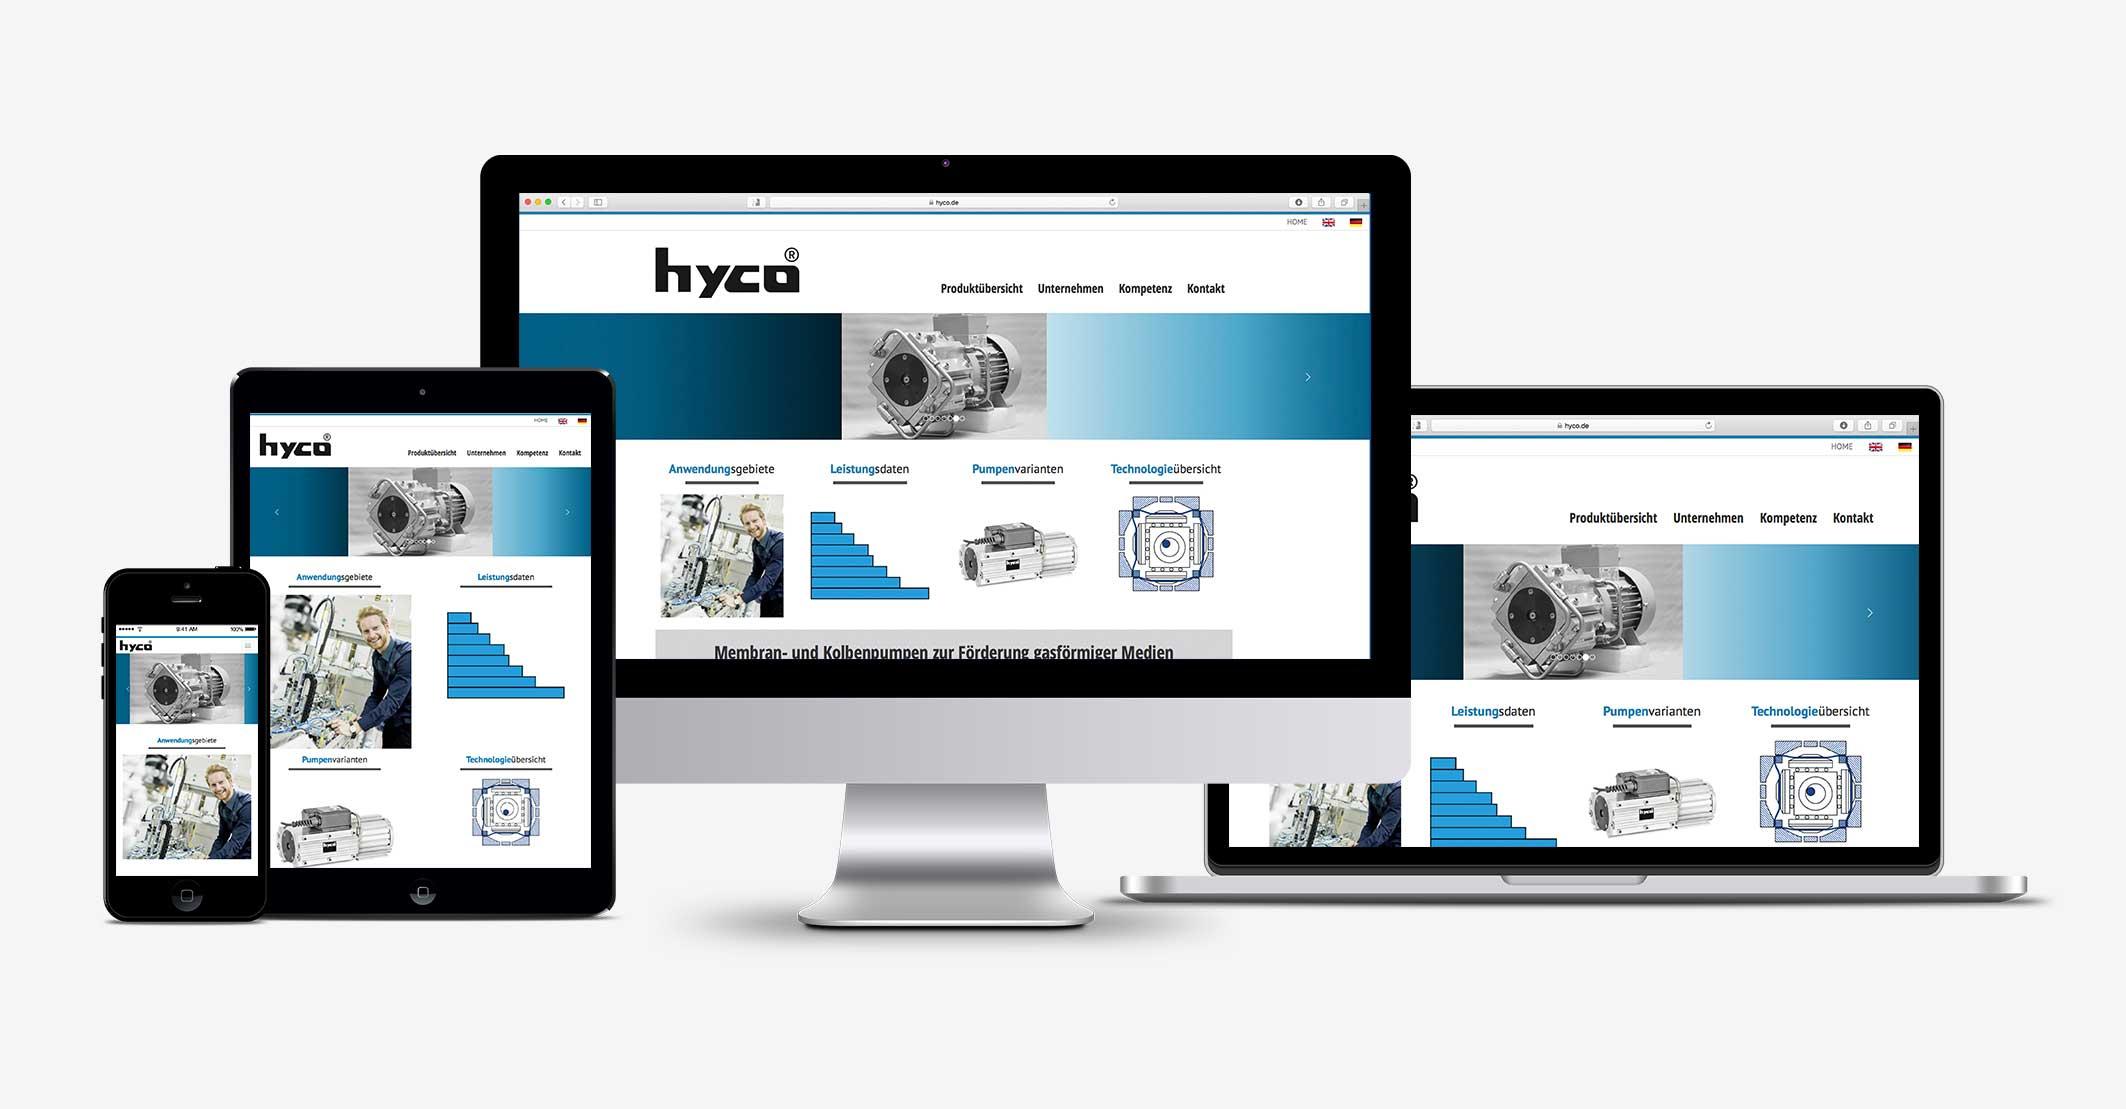 Original hyco responsive showcase mockup web v2